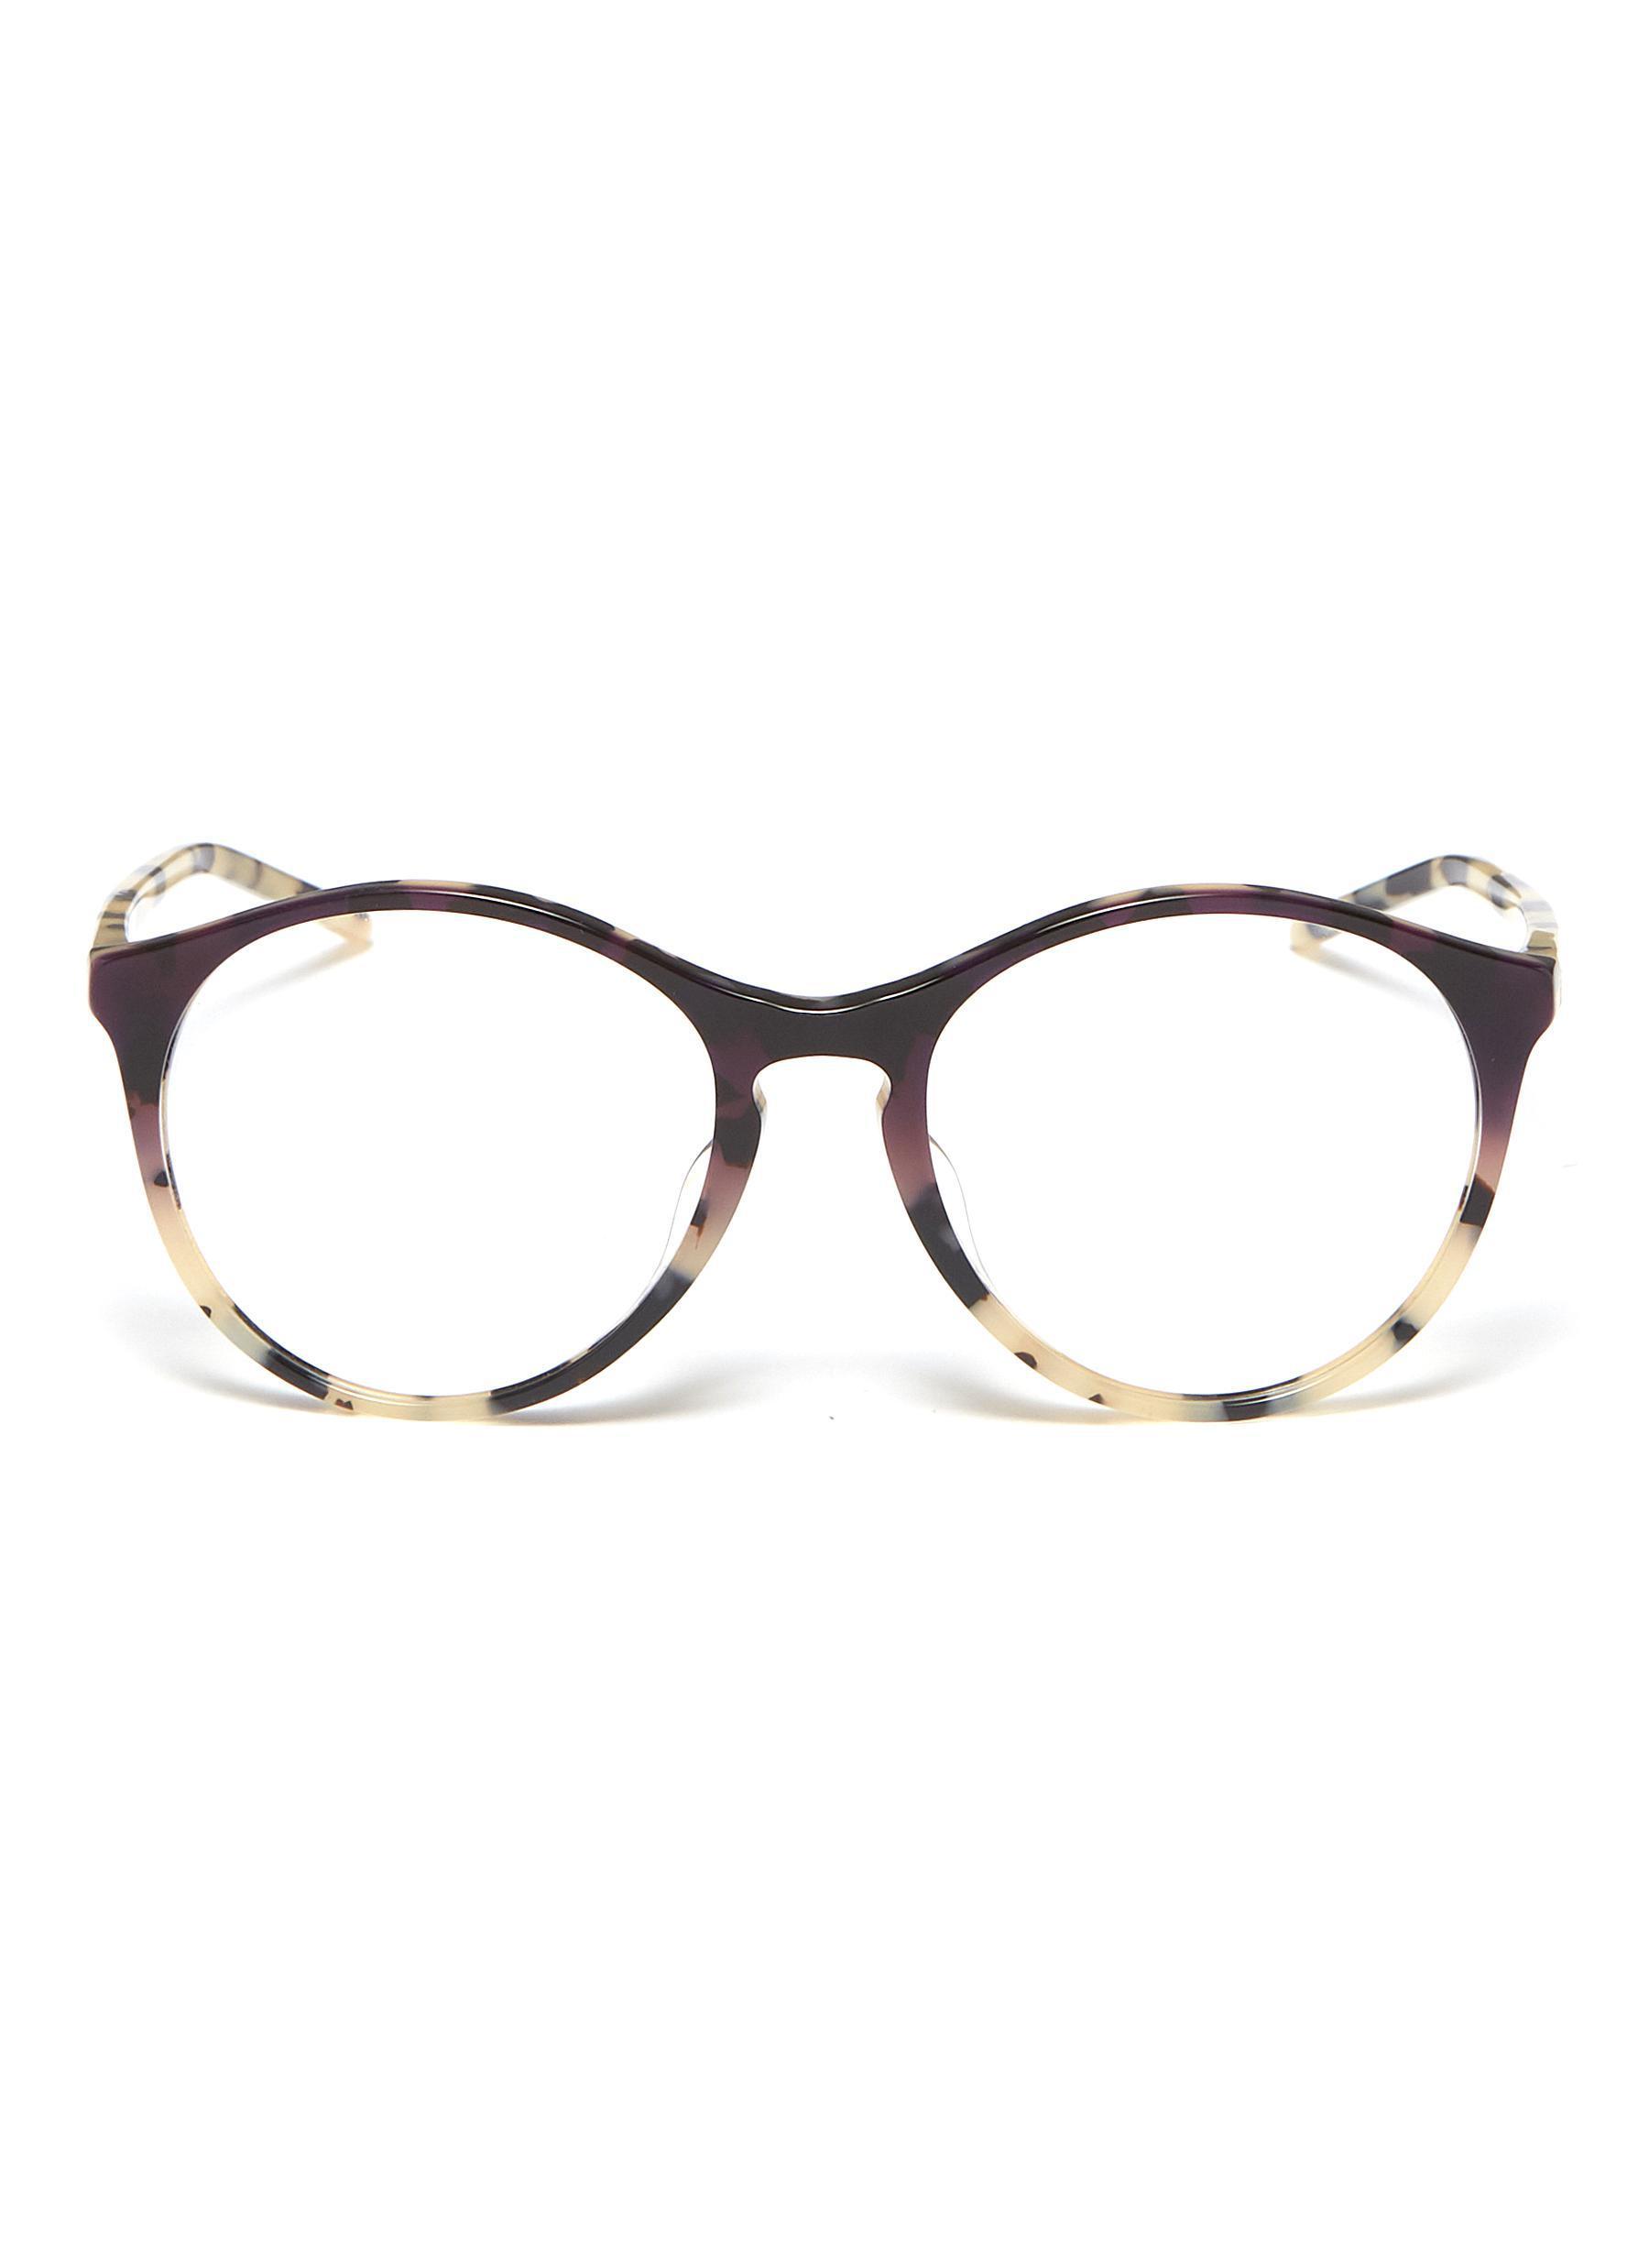 29ec8982241f97 Ray-Ban  rx5371  Tortoiseshell Acetate Panto Optical Glasses - Lyst